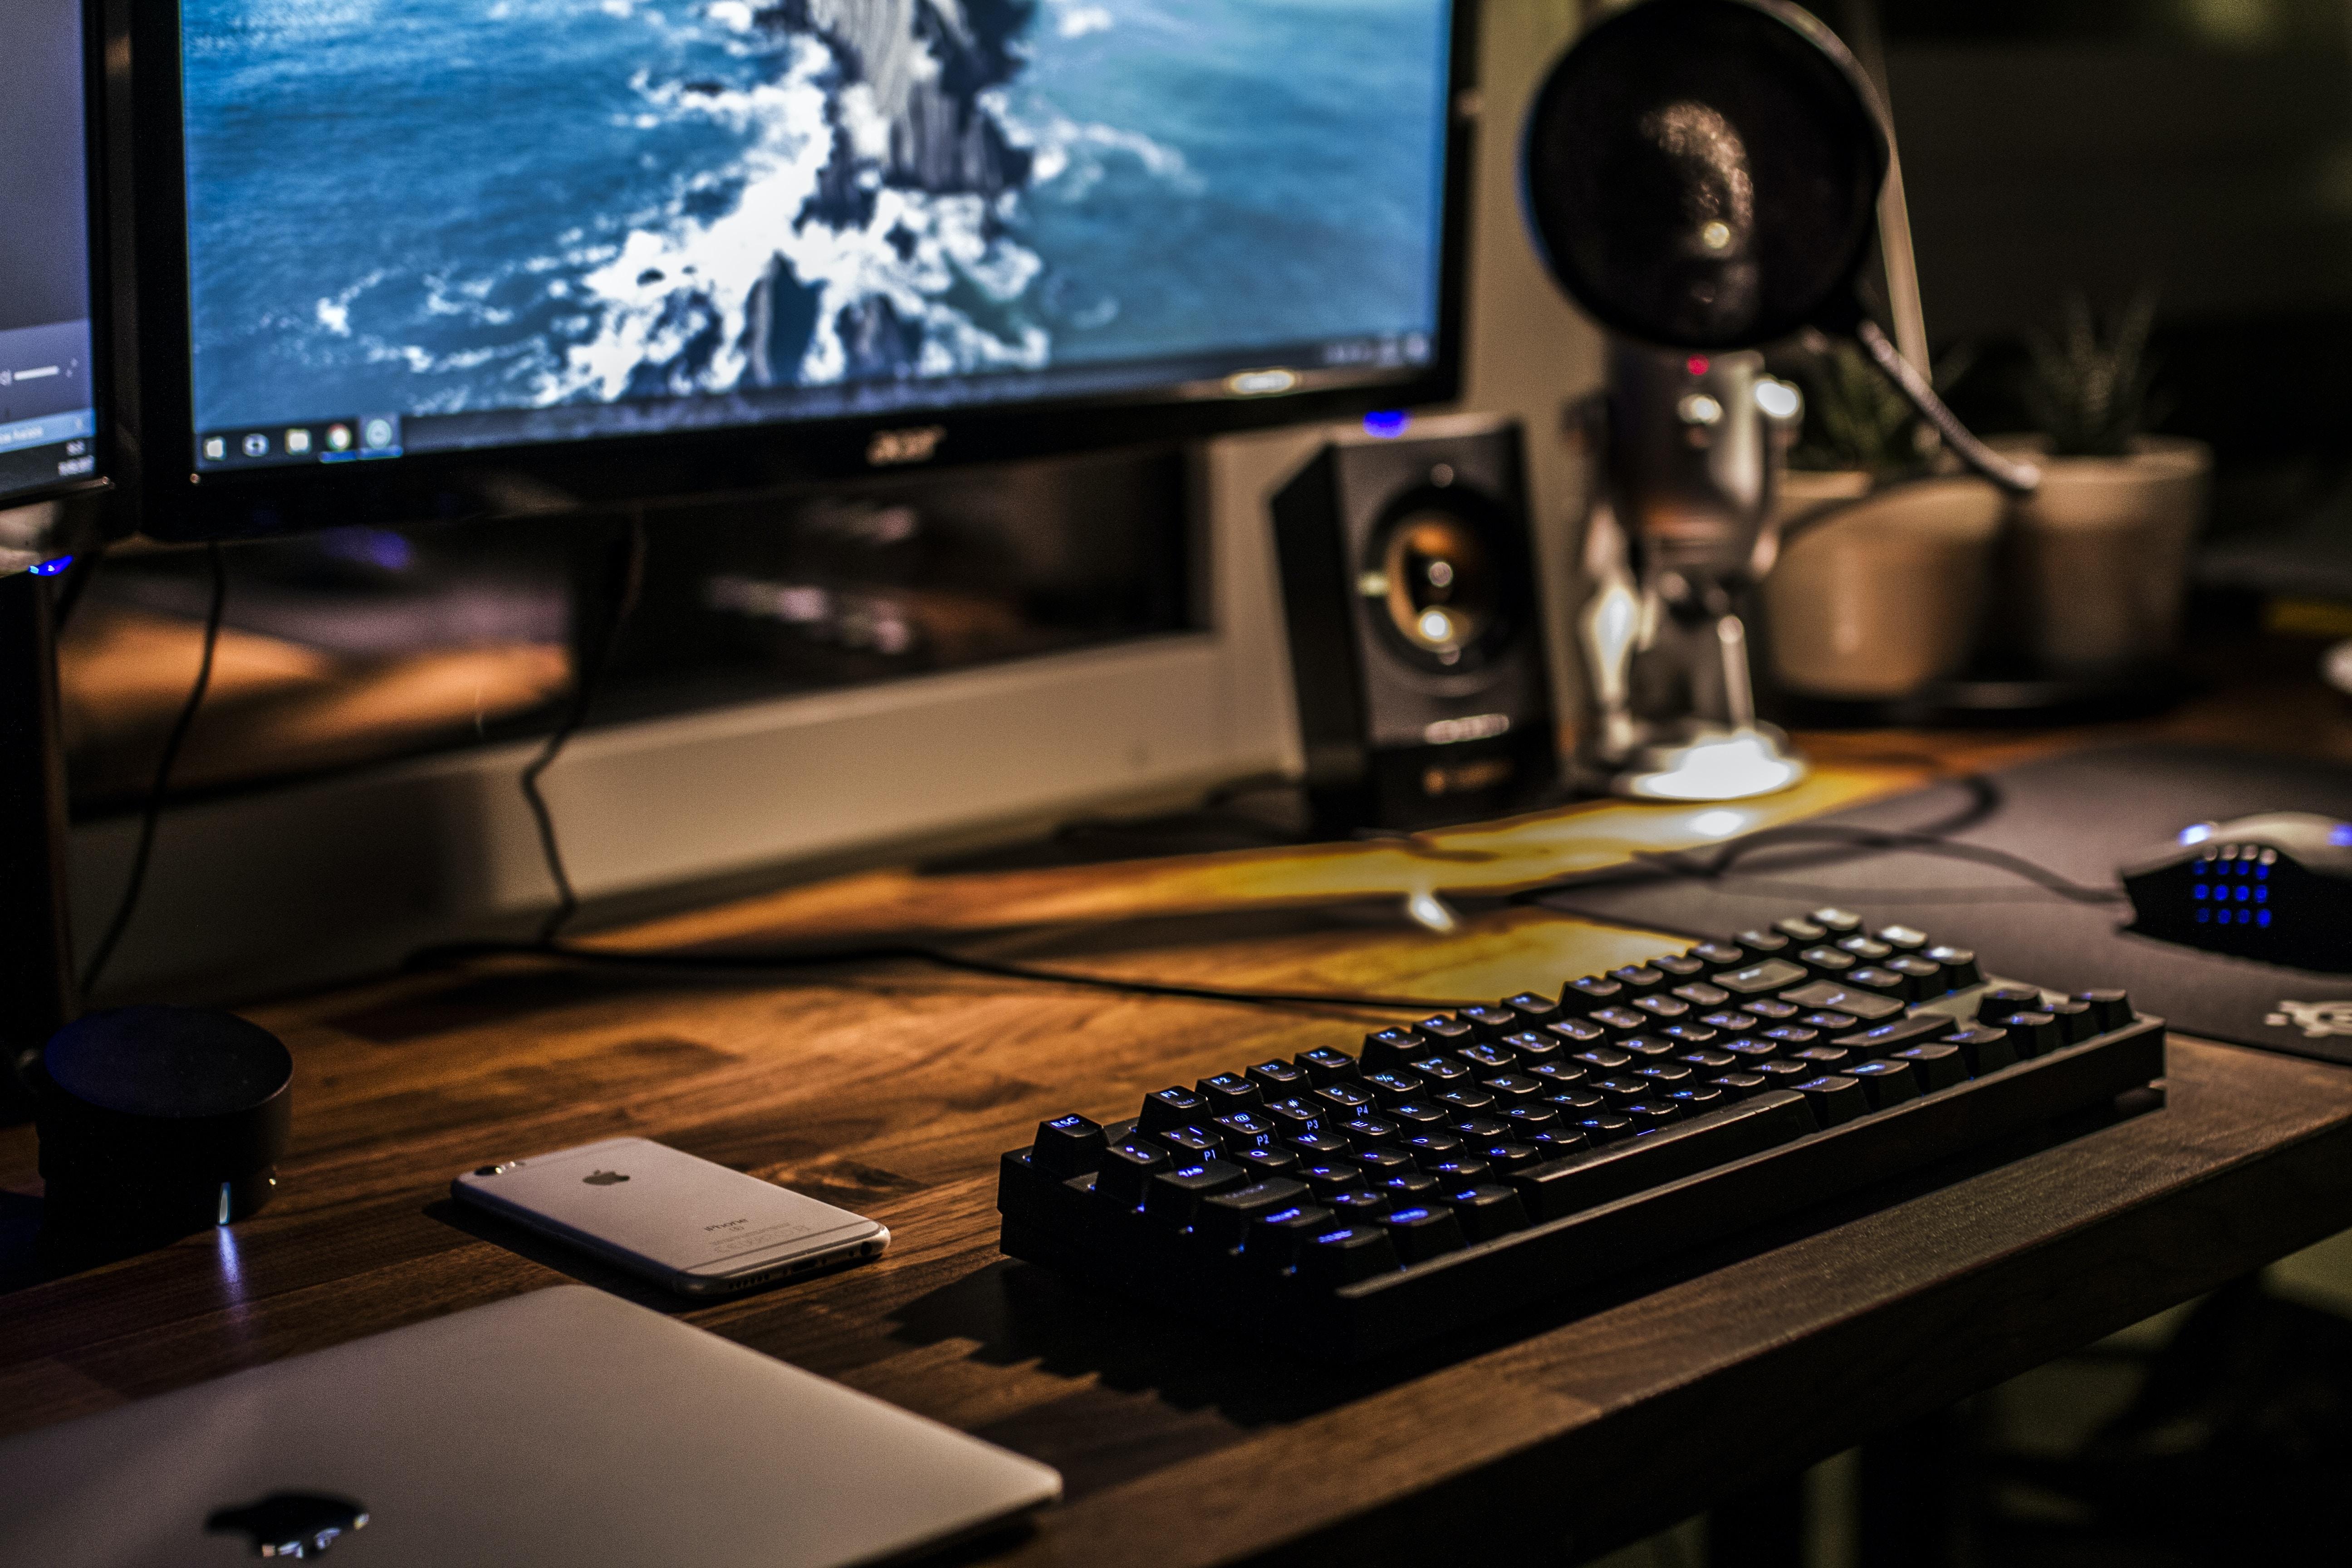 black corded gaming computer keyboard and flat screen monitor